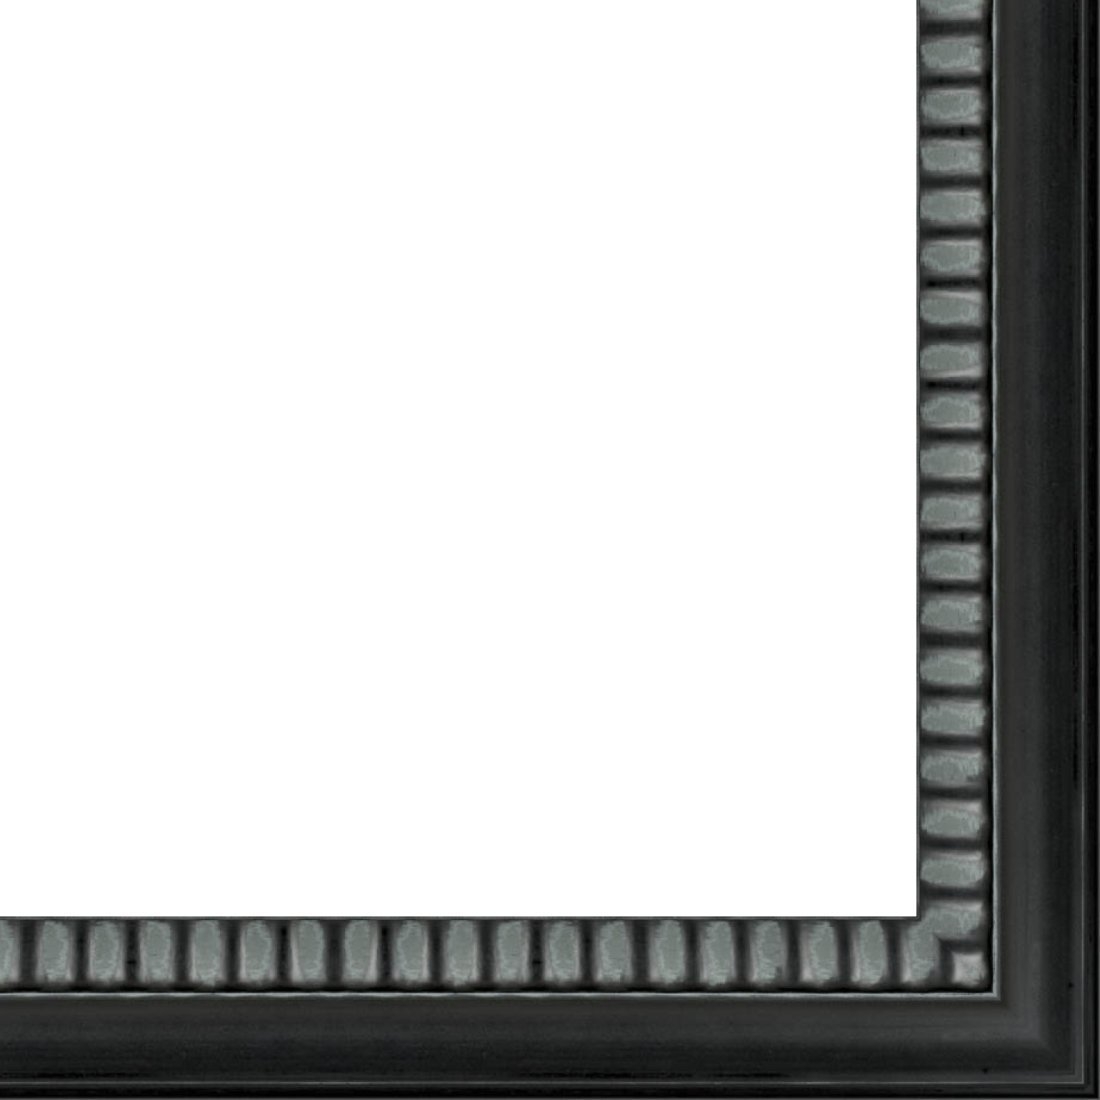 Picture Frame Moulding (Wood) 18ft bundle - Contemporary Black Finish - 2.125'' width - 1/2'' rabbet depth